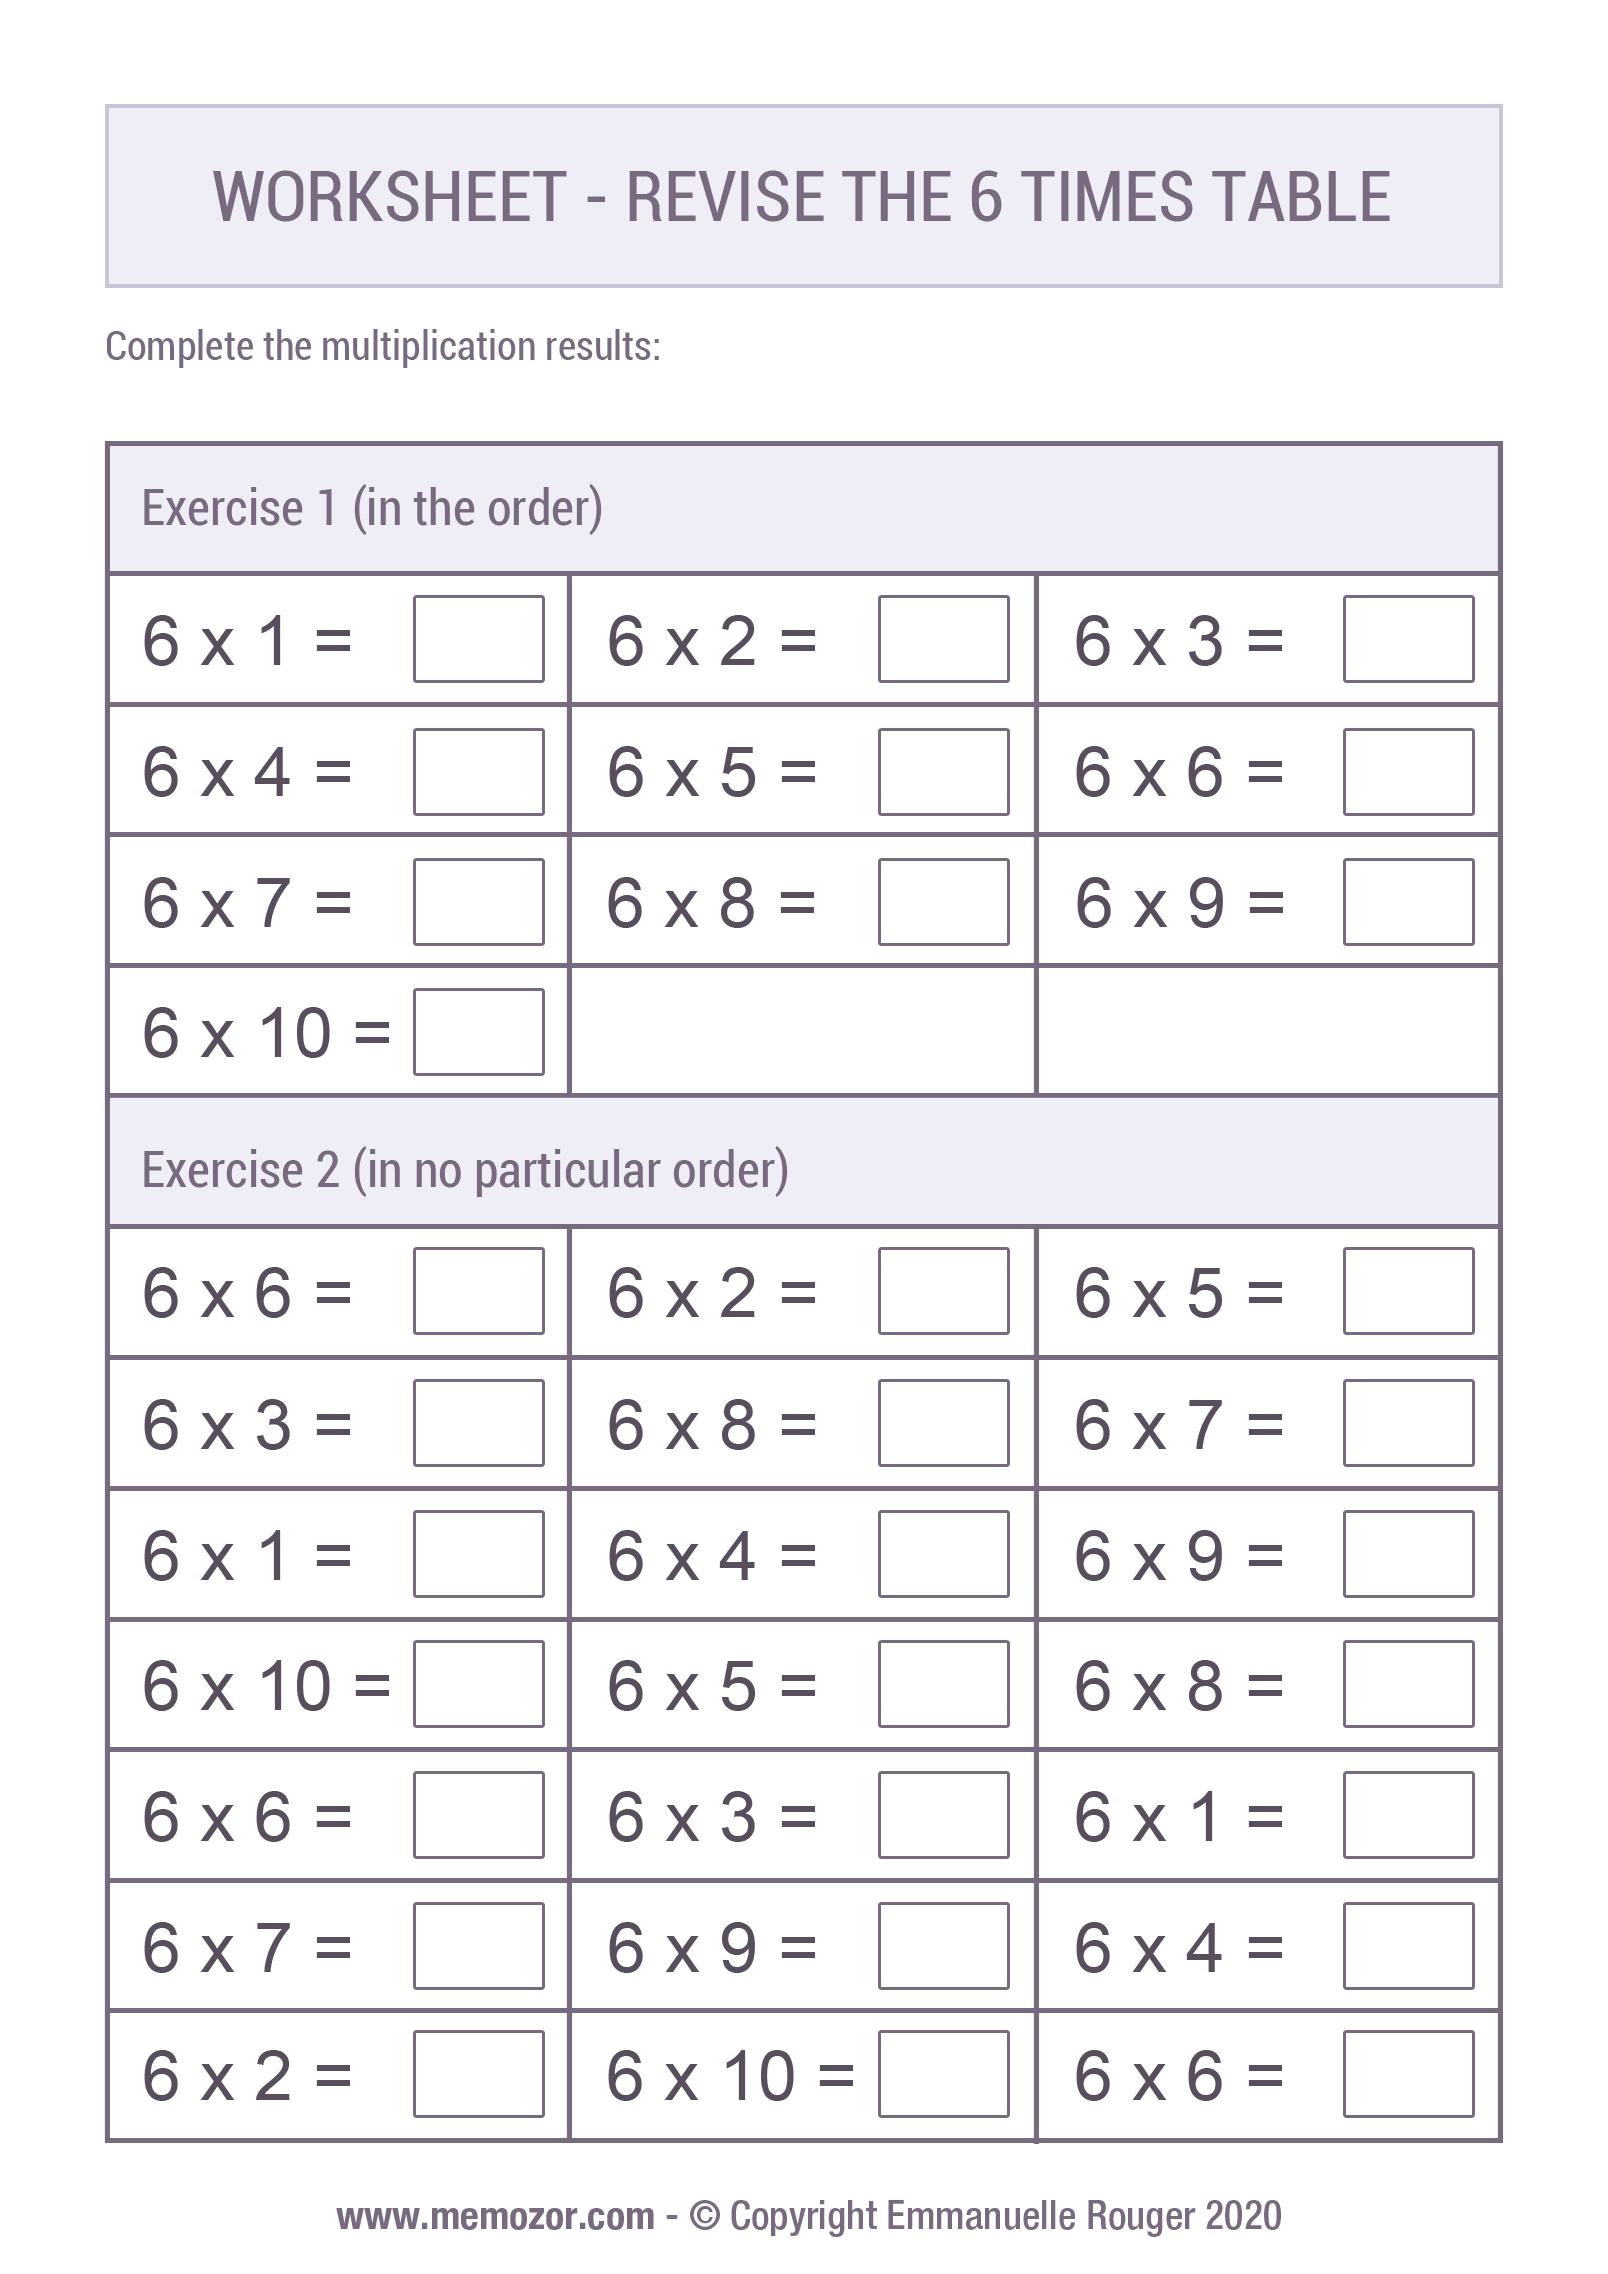 Printable Worksheet Revise The 6 Times Table Memozor